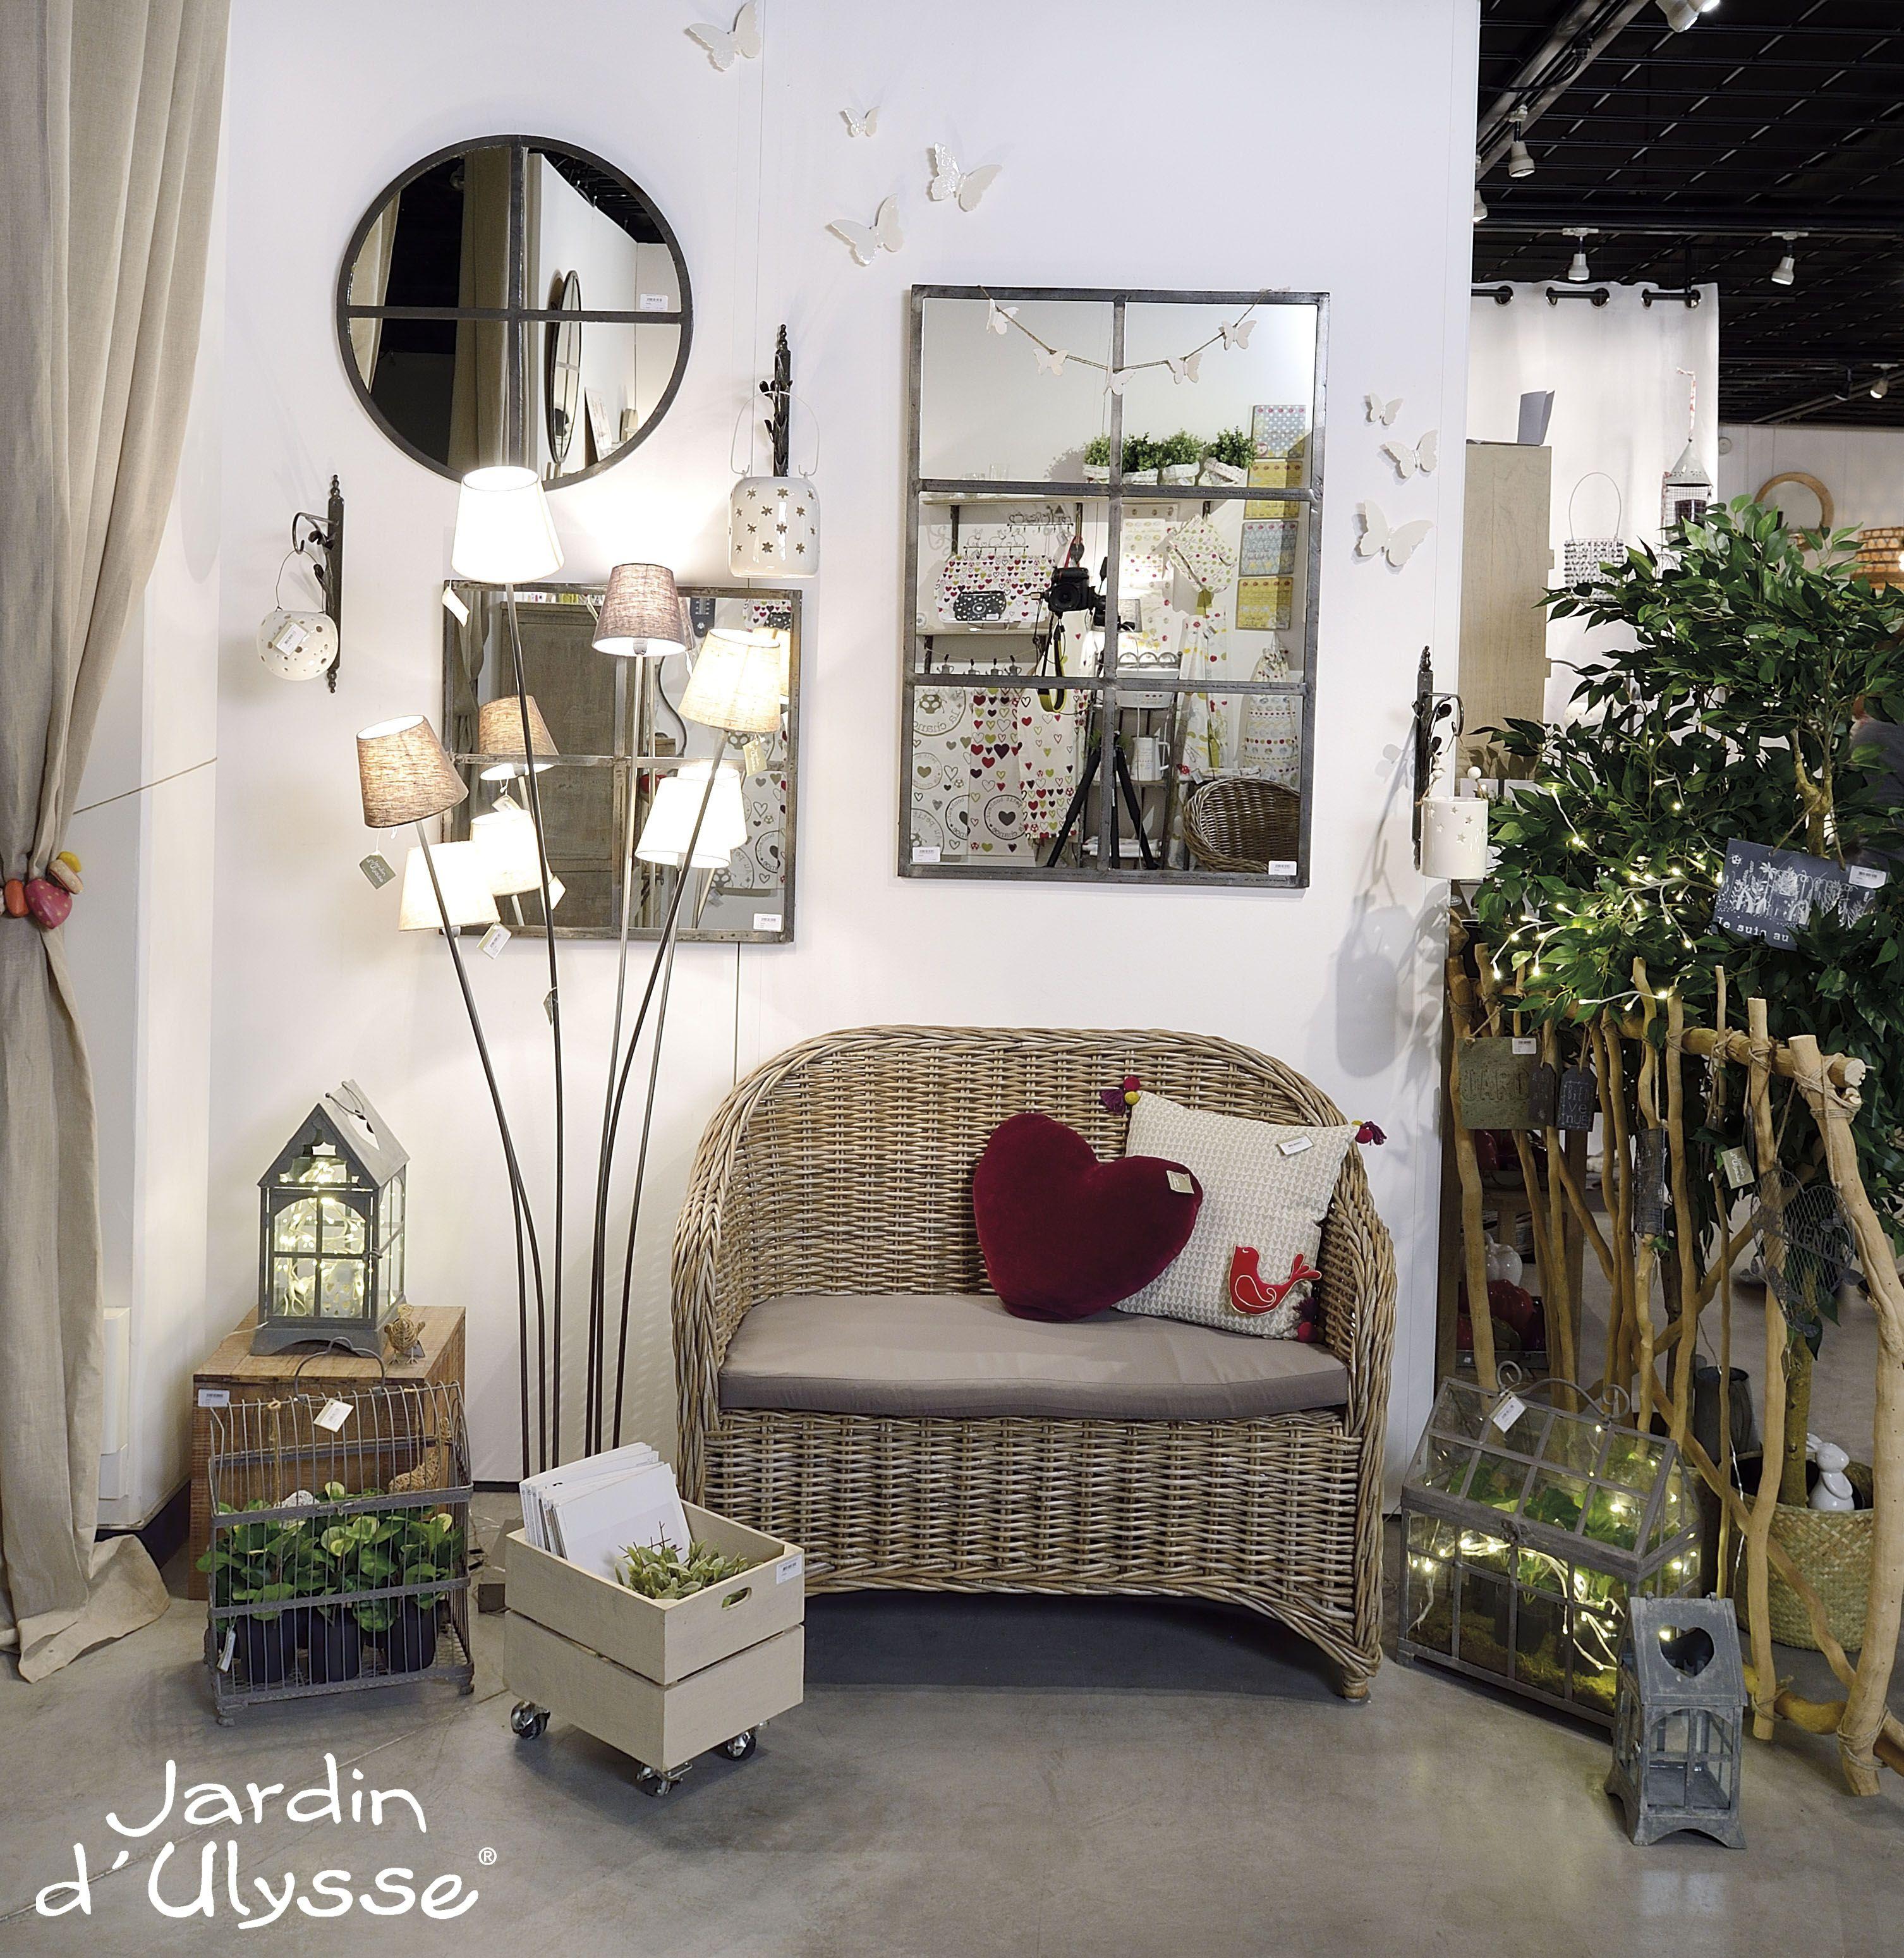 Jardin D Ulysse Printemps T 2014 Koko Deko Pinterest Boutique # Meuble Tv Jardin D'Ulysse